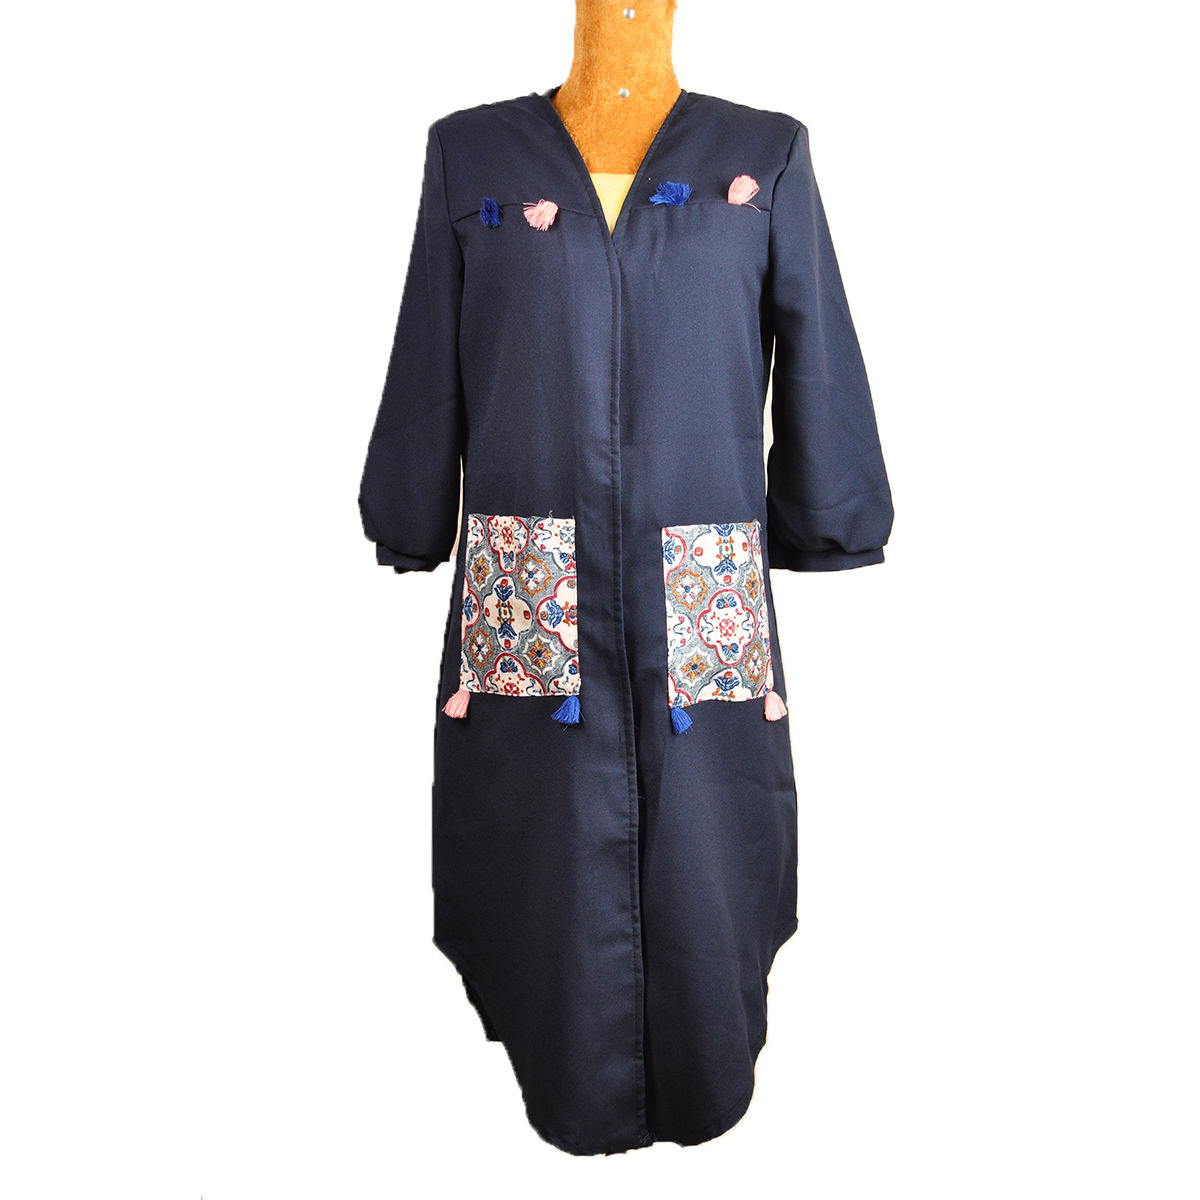 مانتو زنانه طرح سنتی کد 022